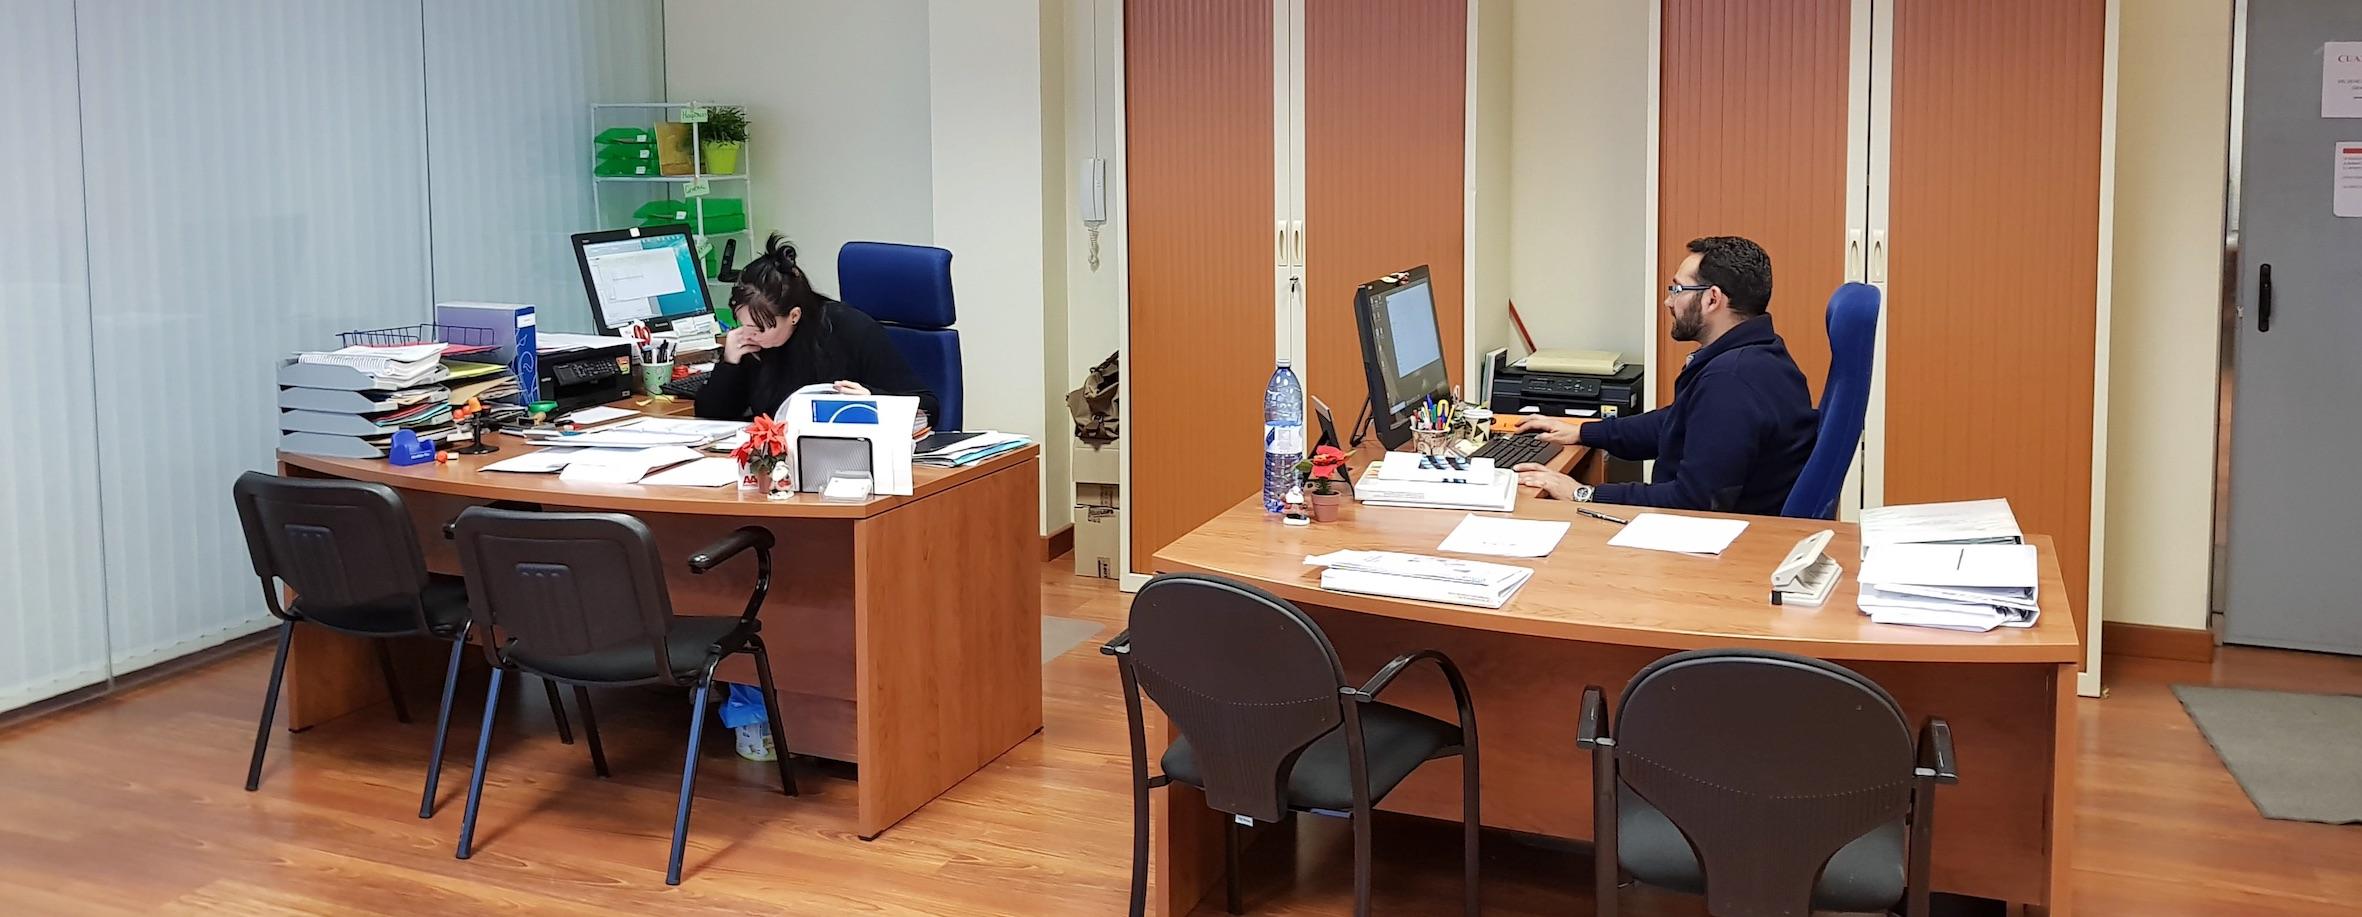 Oficina interclima 6 interclima salamanca for Oficina correos salamanca